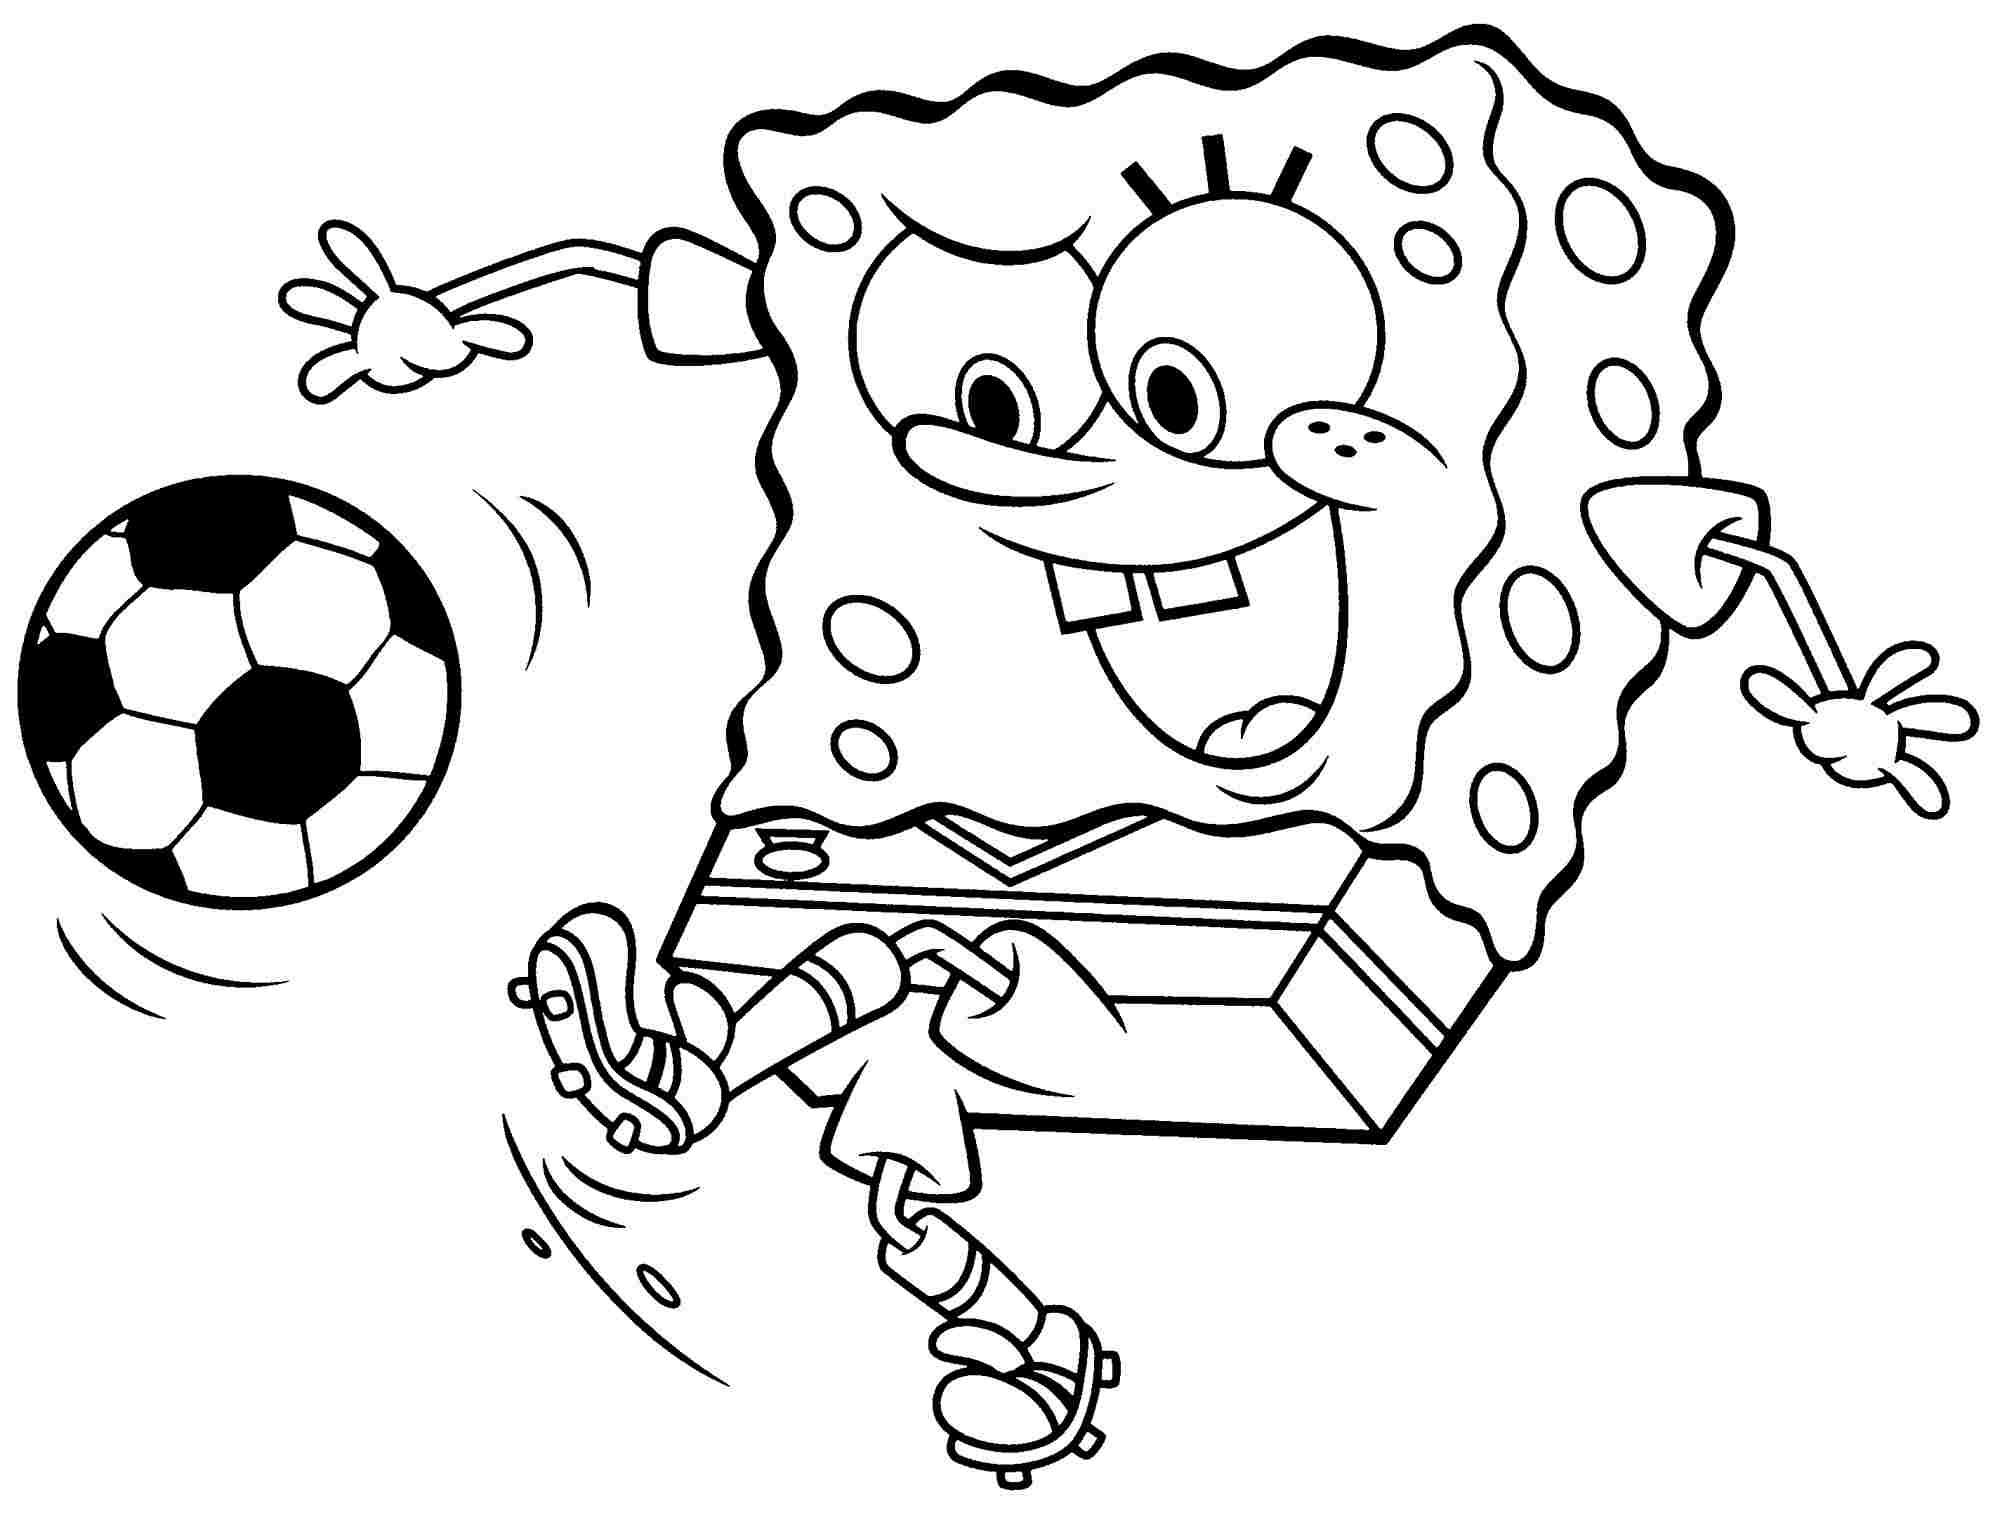 2000x1513 Focus Spongebob Color Sheets Mainstream Colori